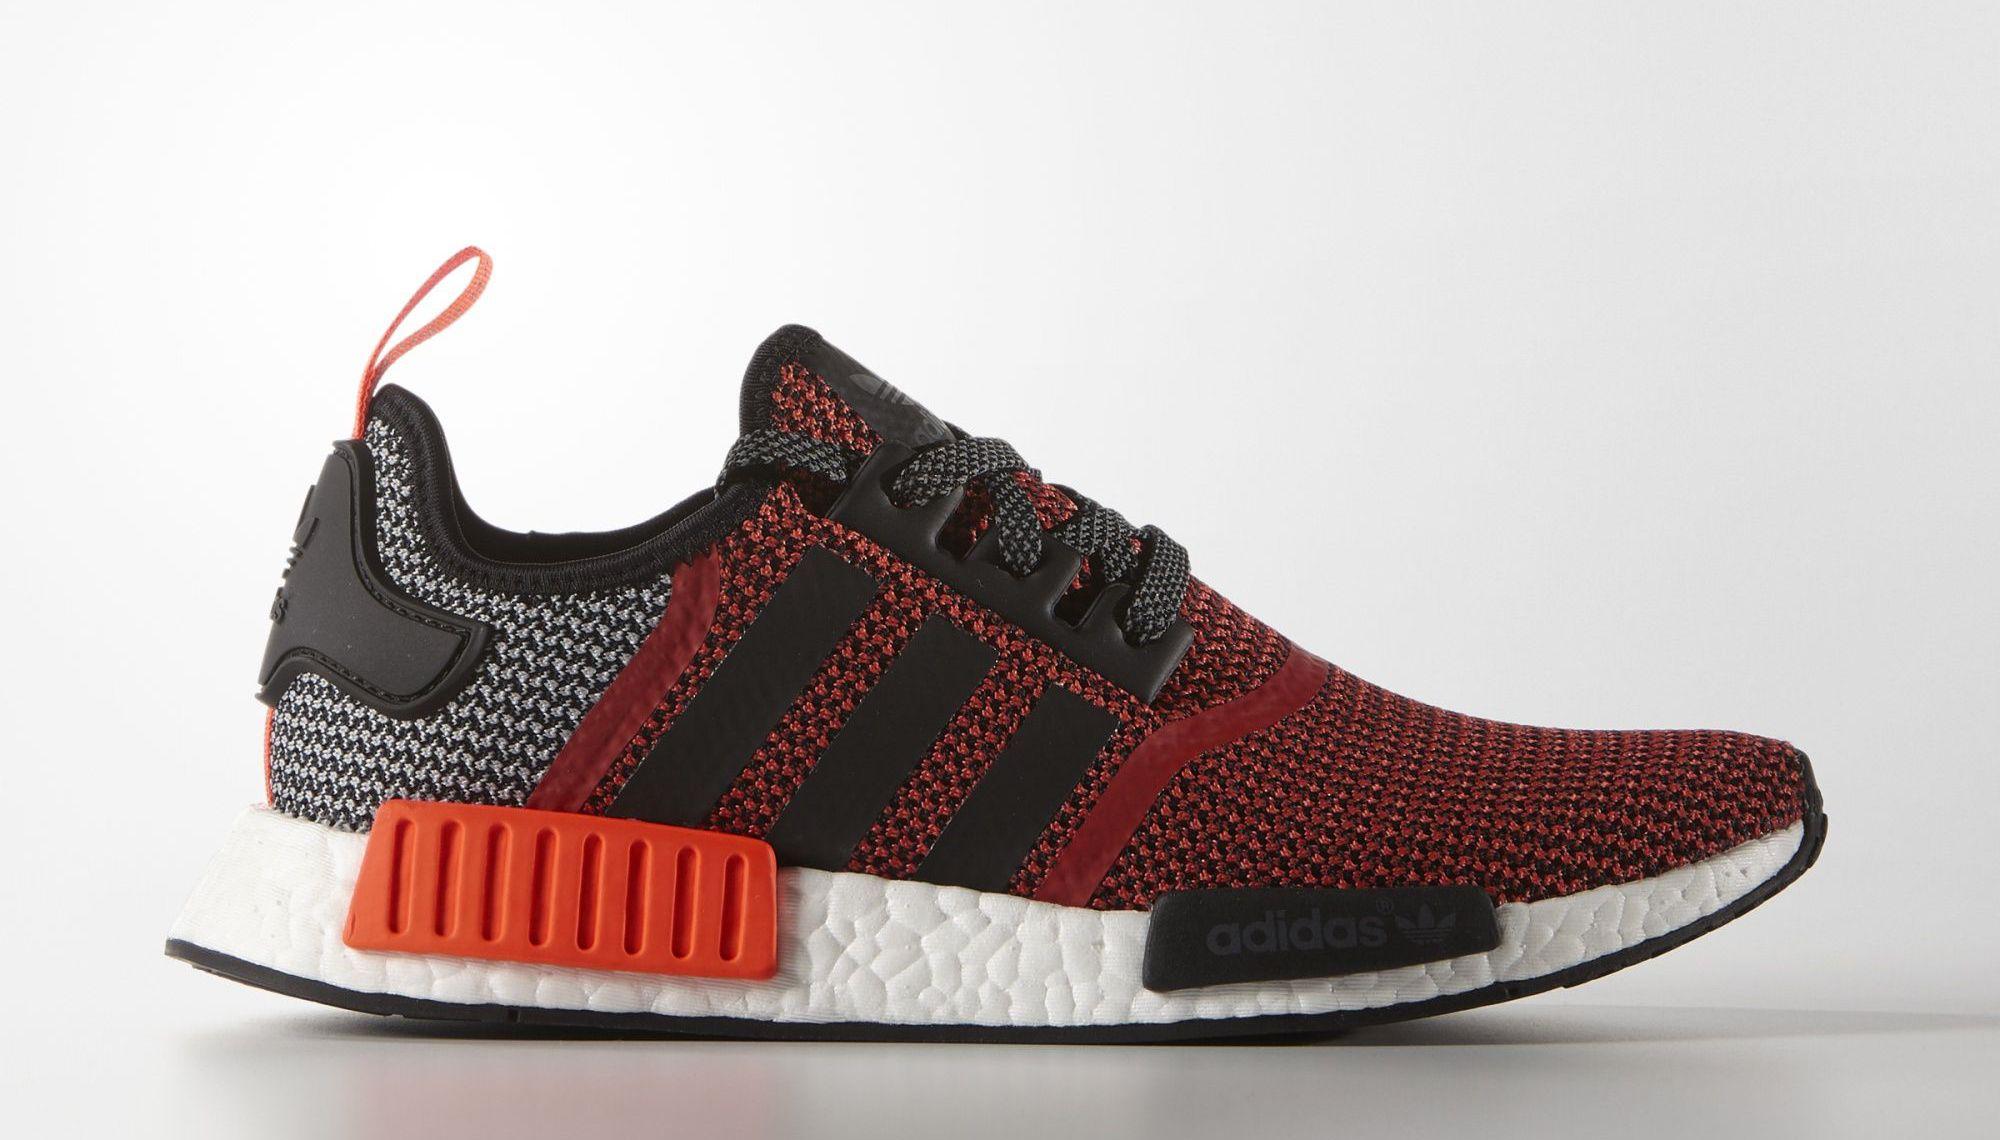 Adidas · adidas NMD R1-Lush Red